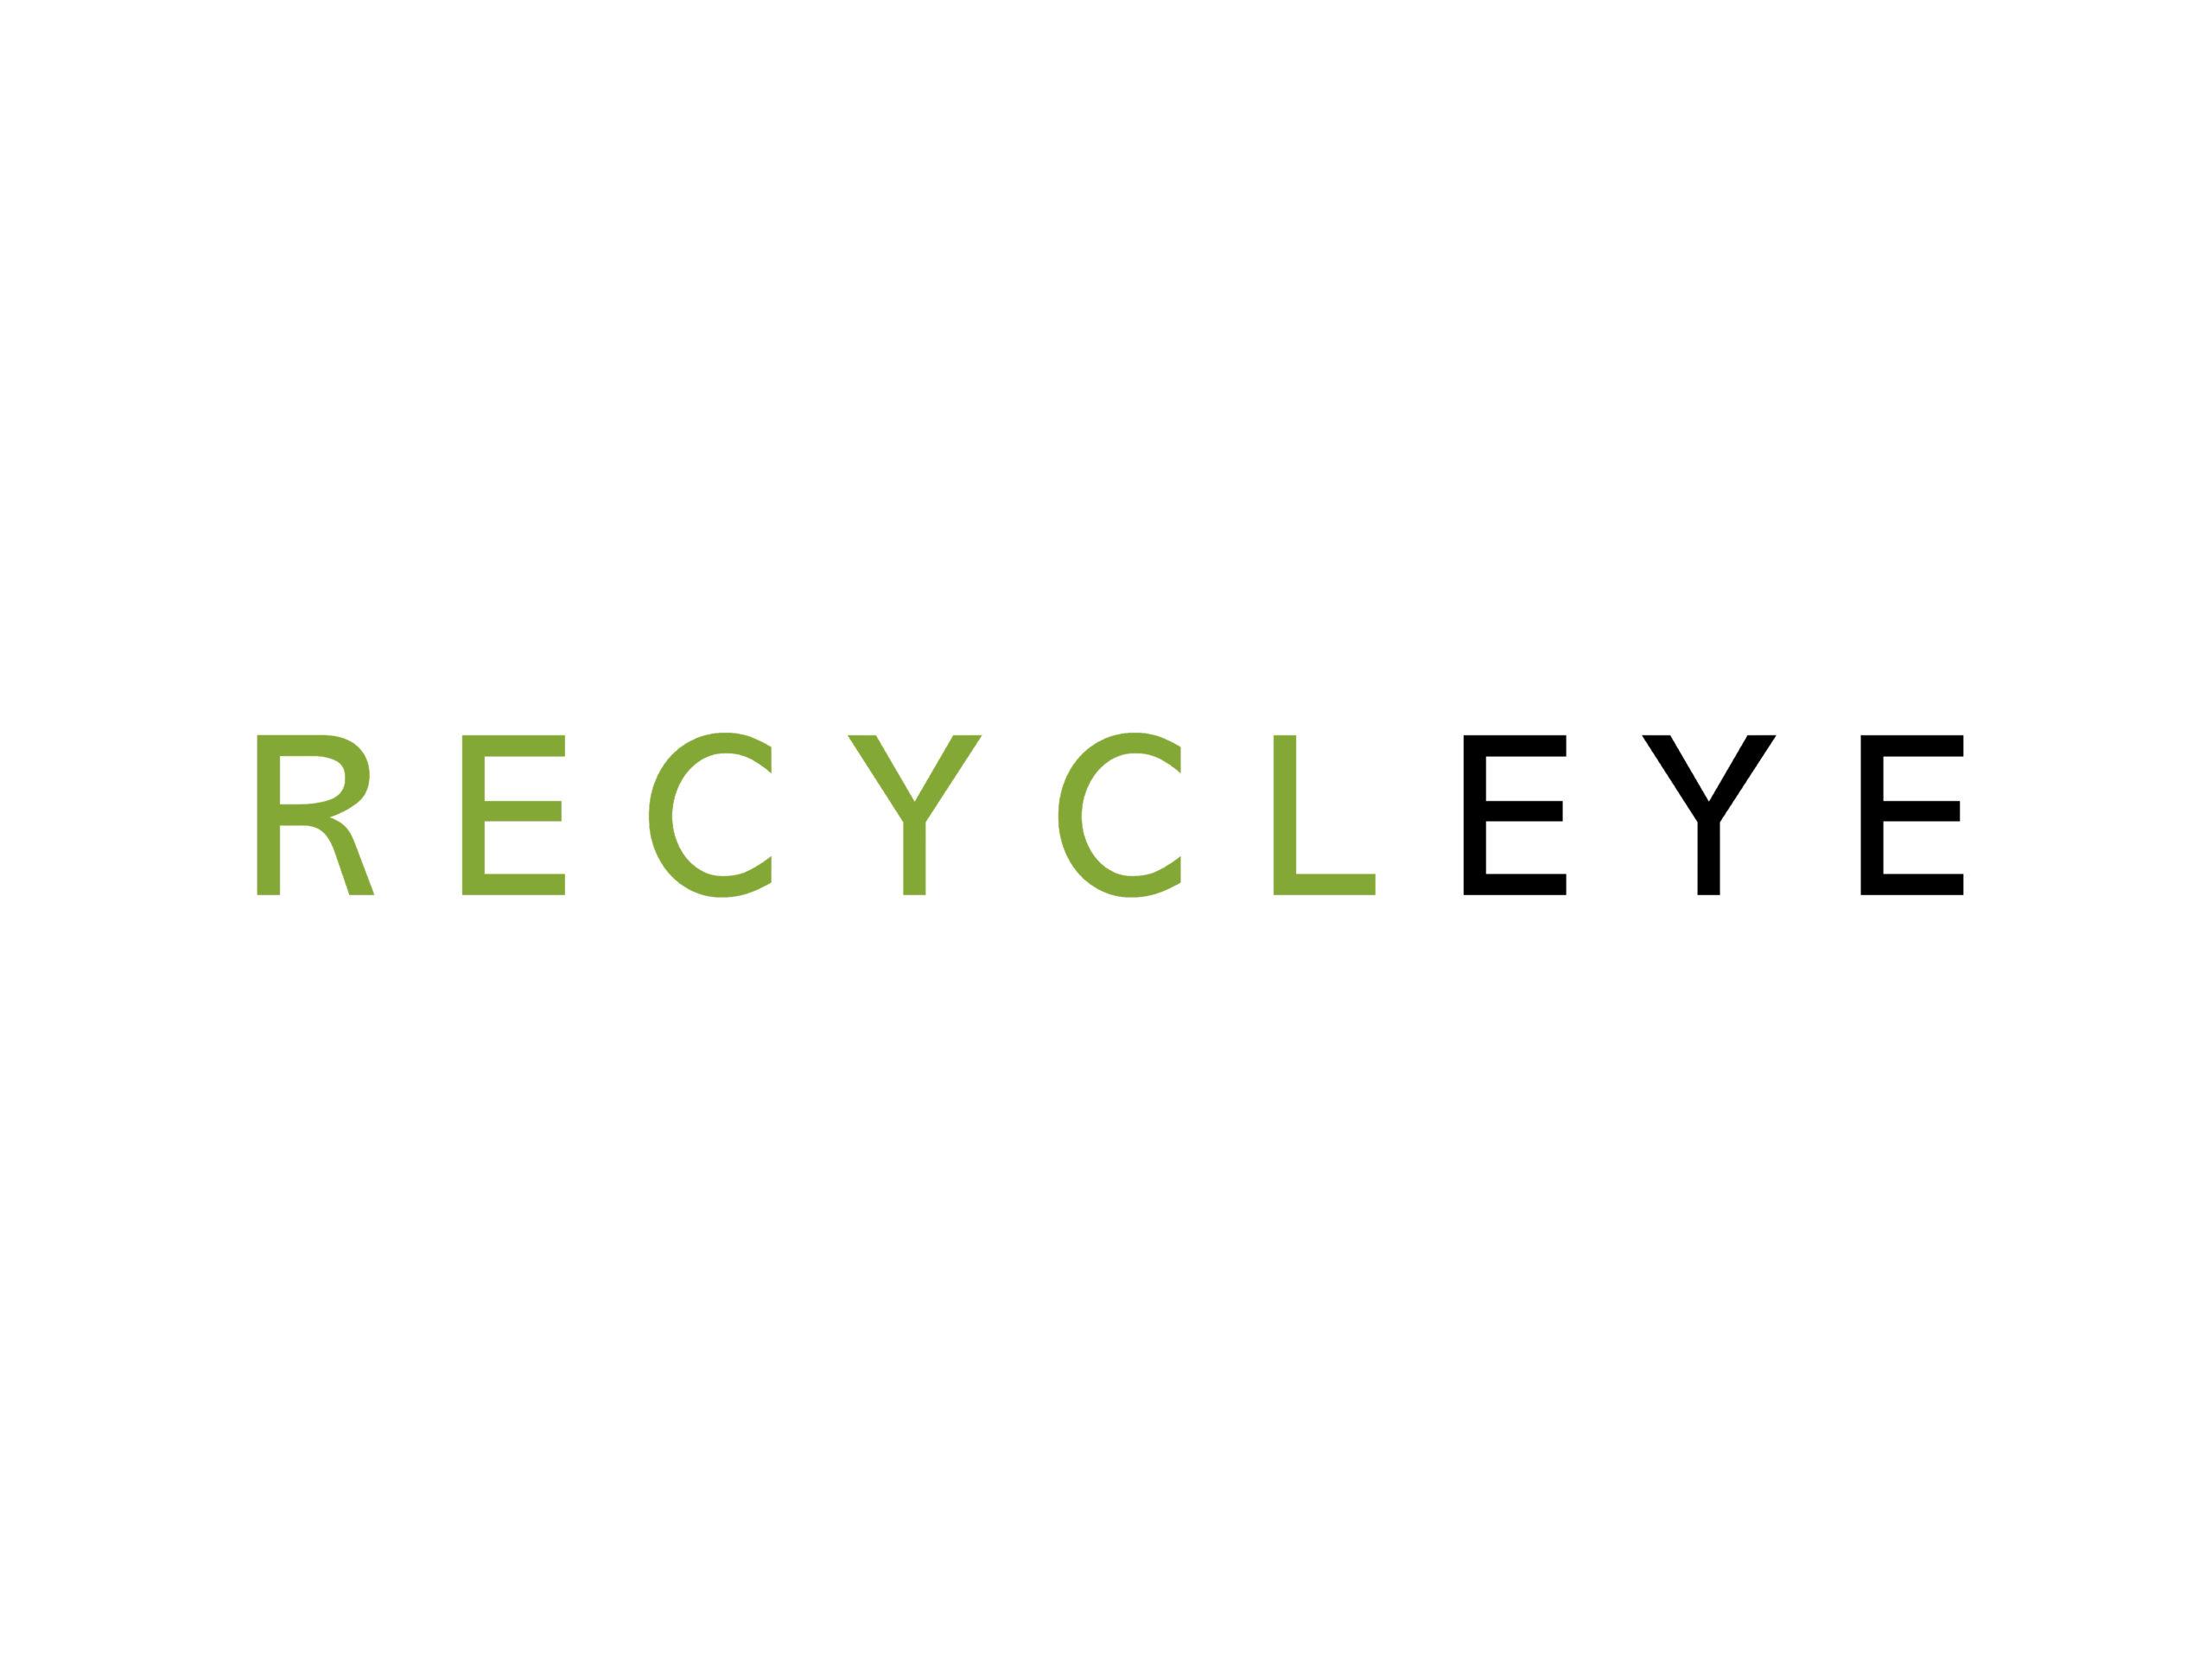 Recycleye